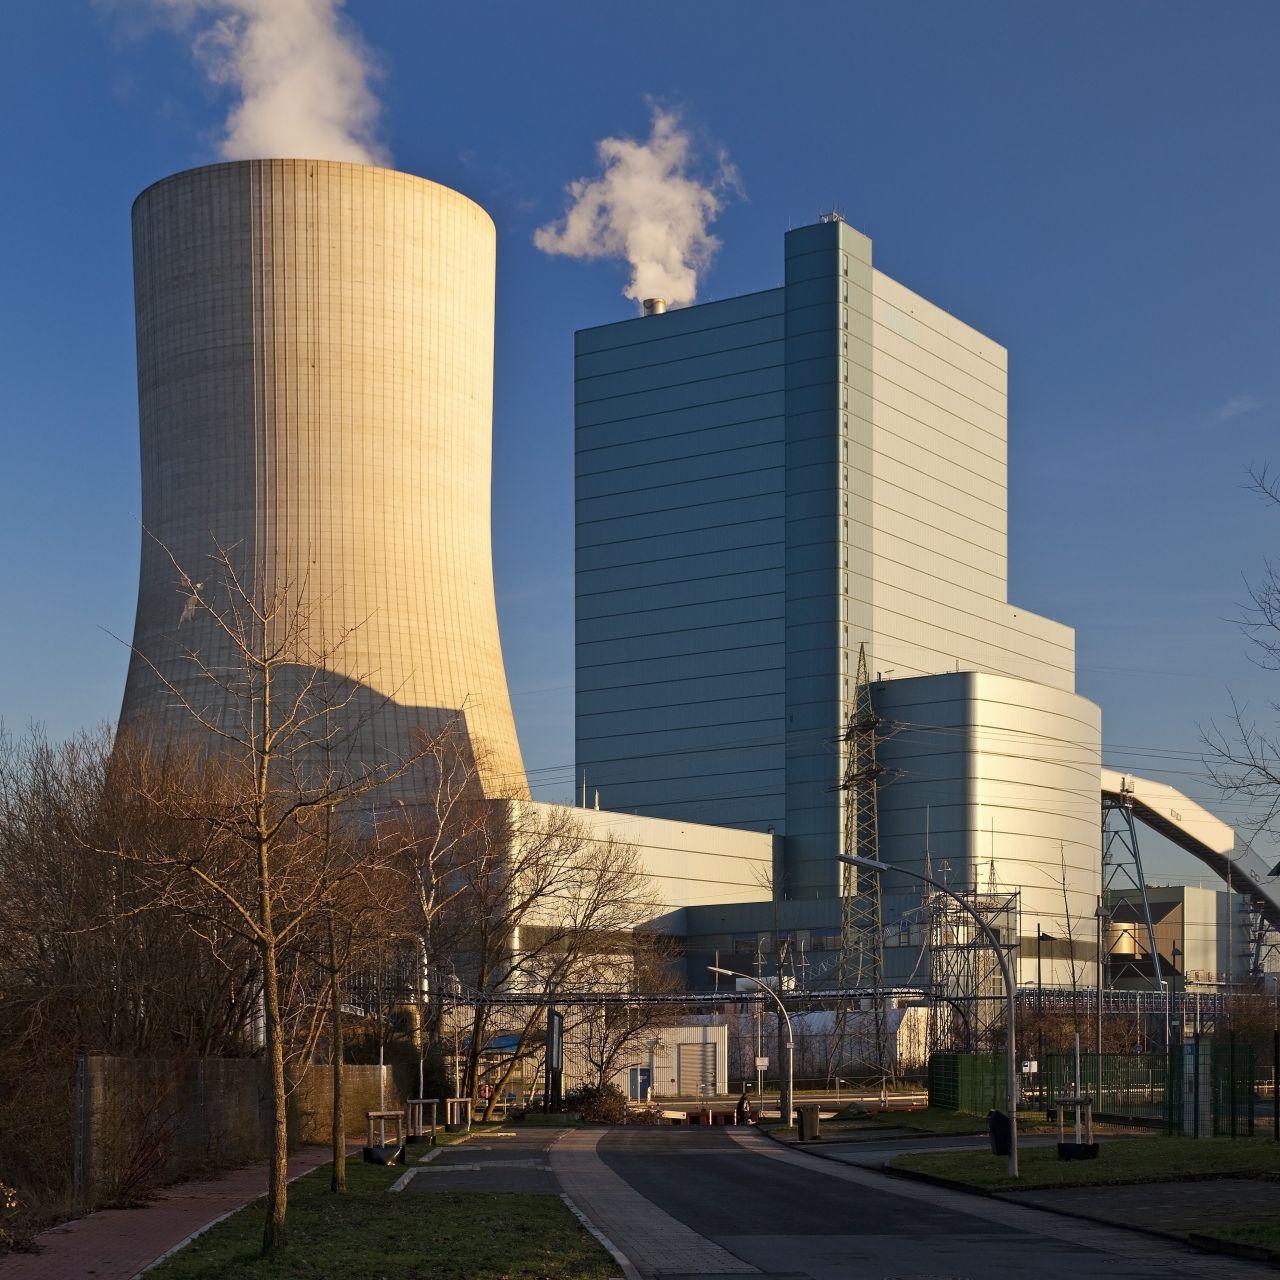 Kohlekraftwerk mit Himmel